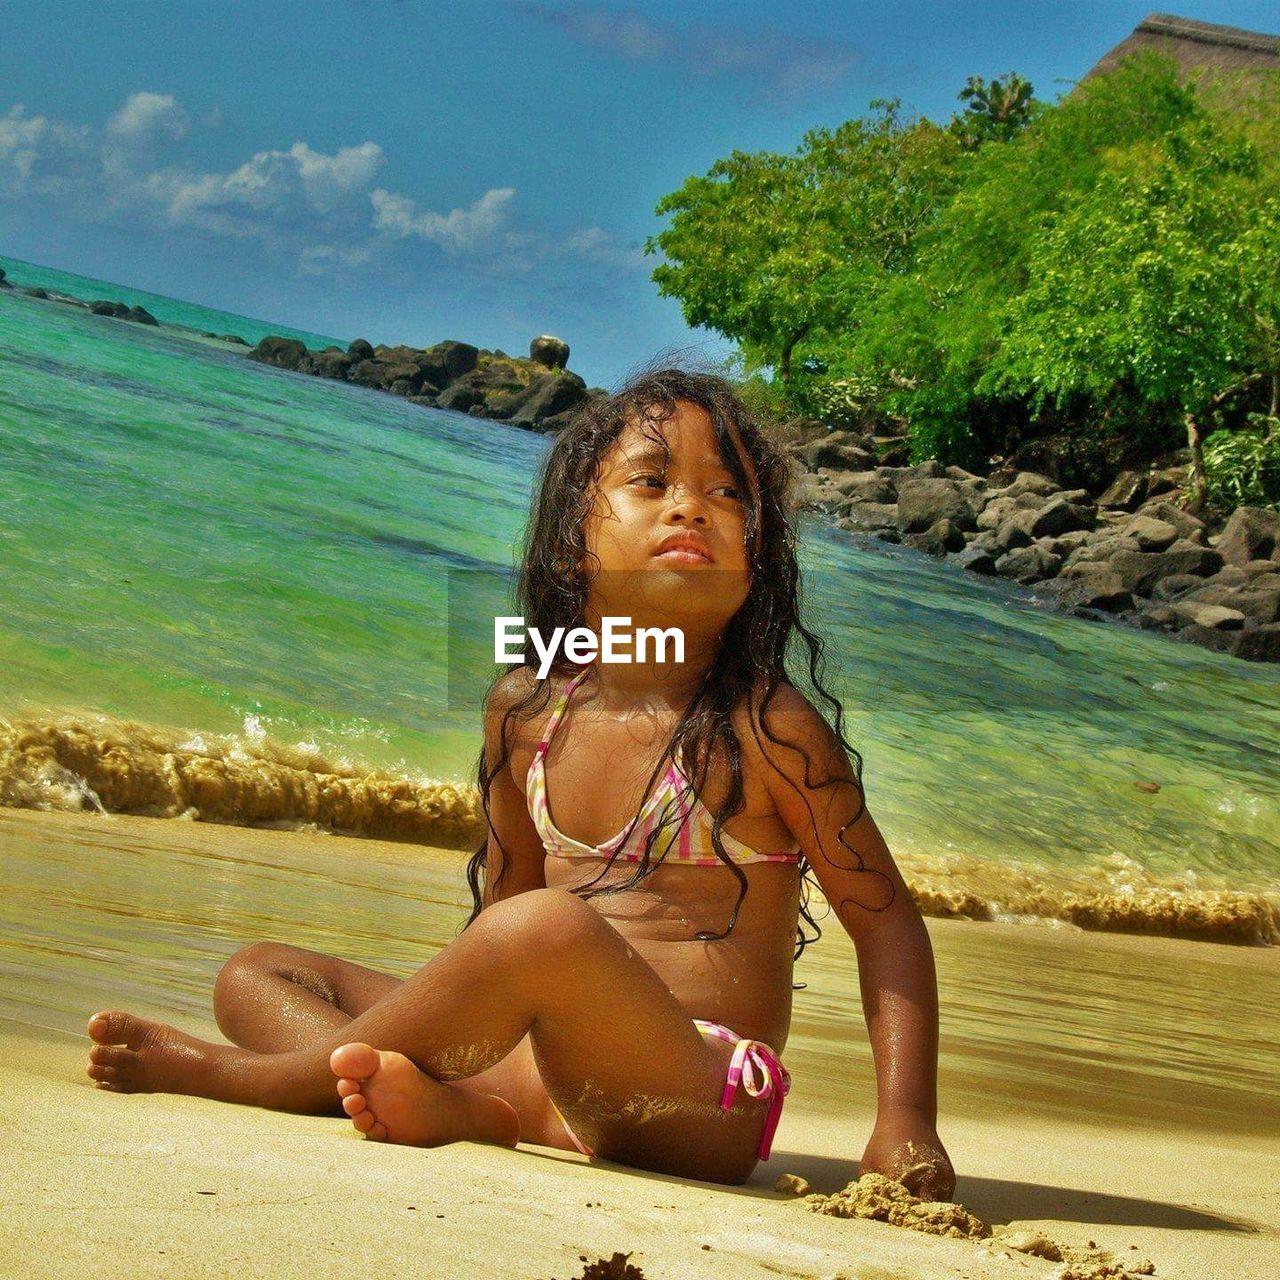 Girl in bikini sitting on shore at beach during sunny day